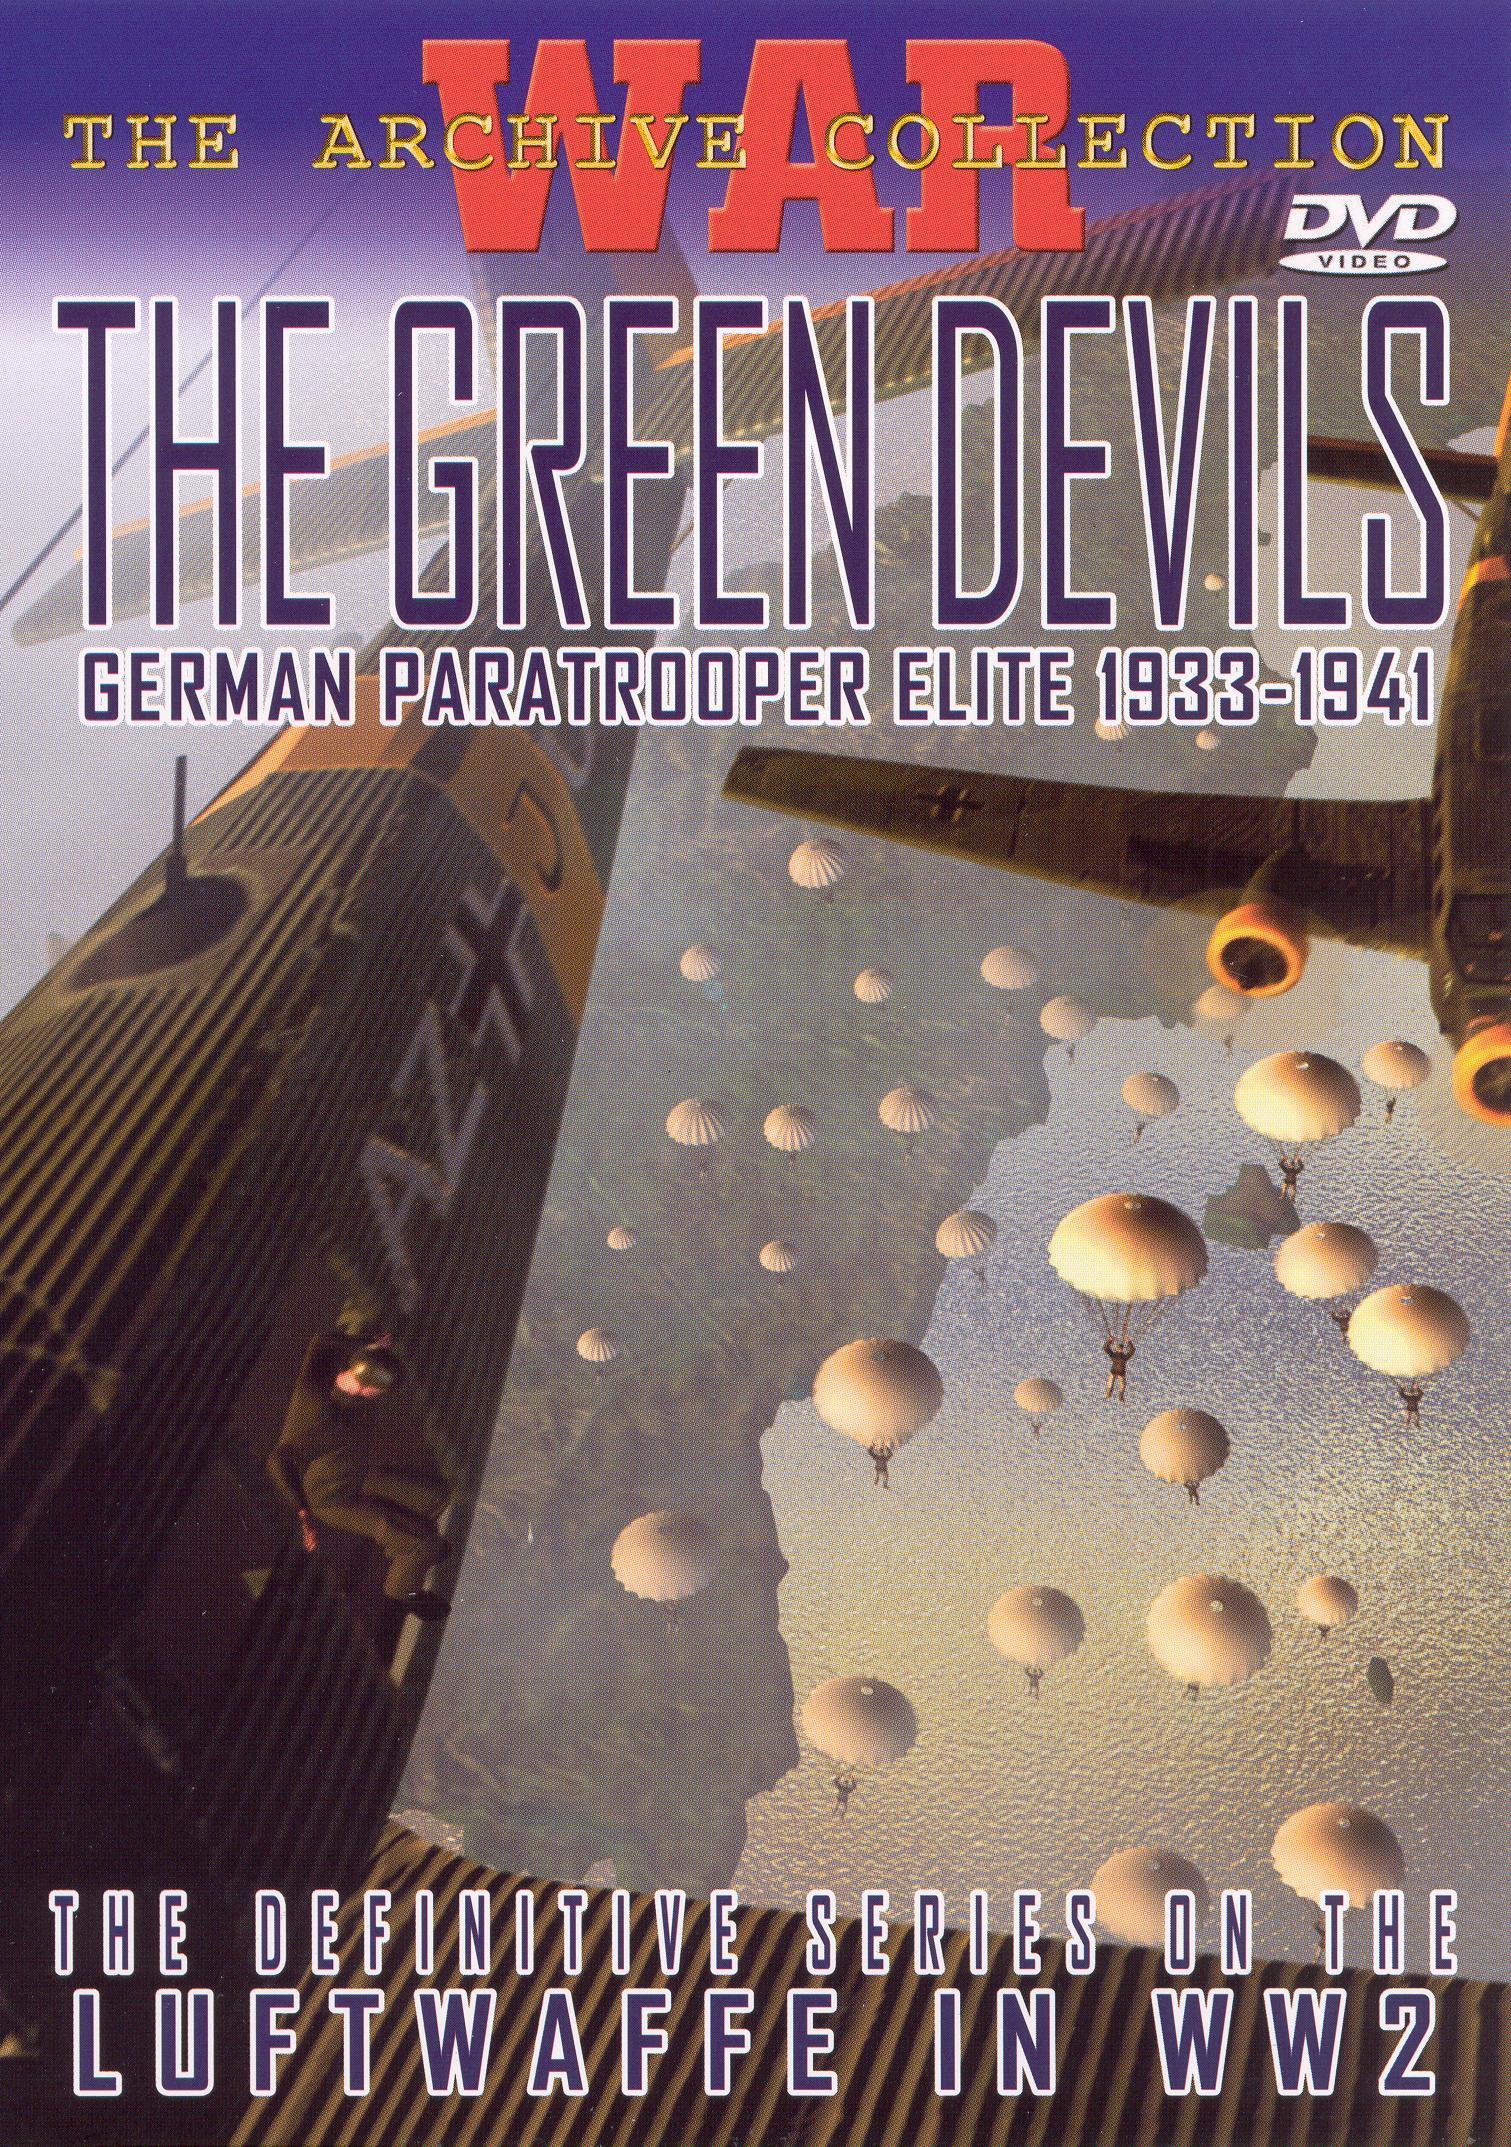 The Green Devils: The German Paratrooper Elite 1933-1941